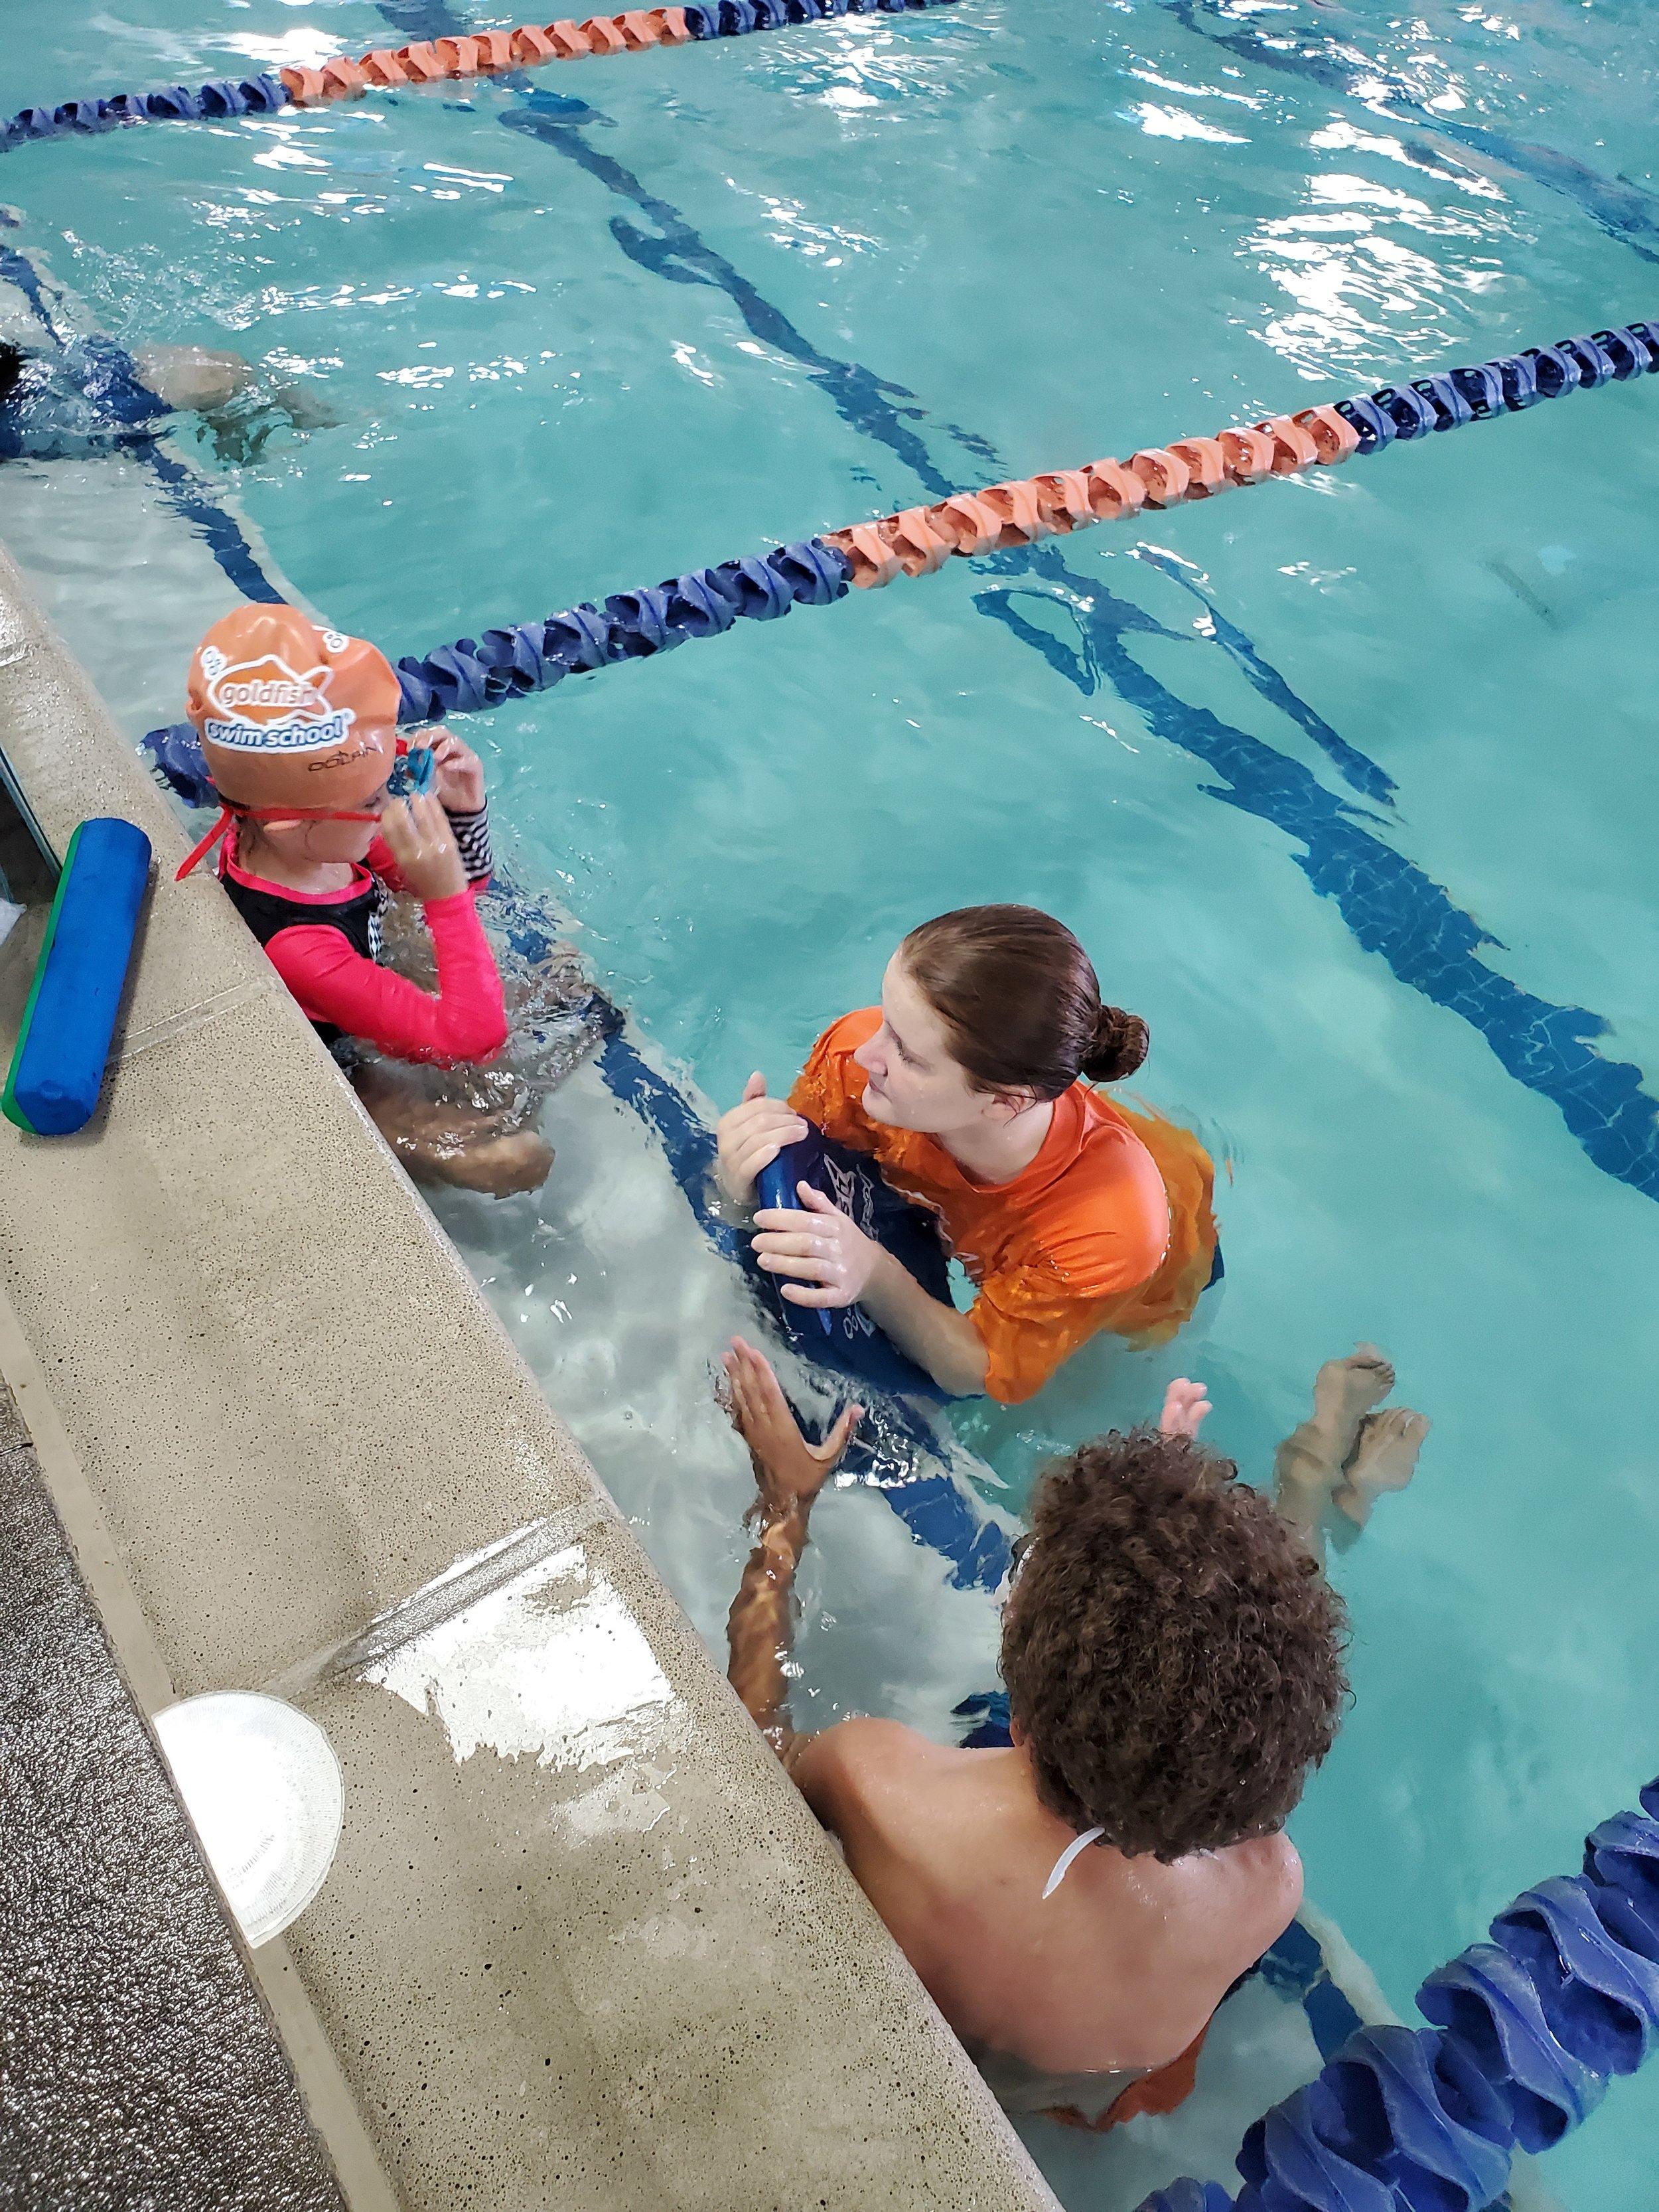 goldfishswimschoollesson.jpg